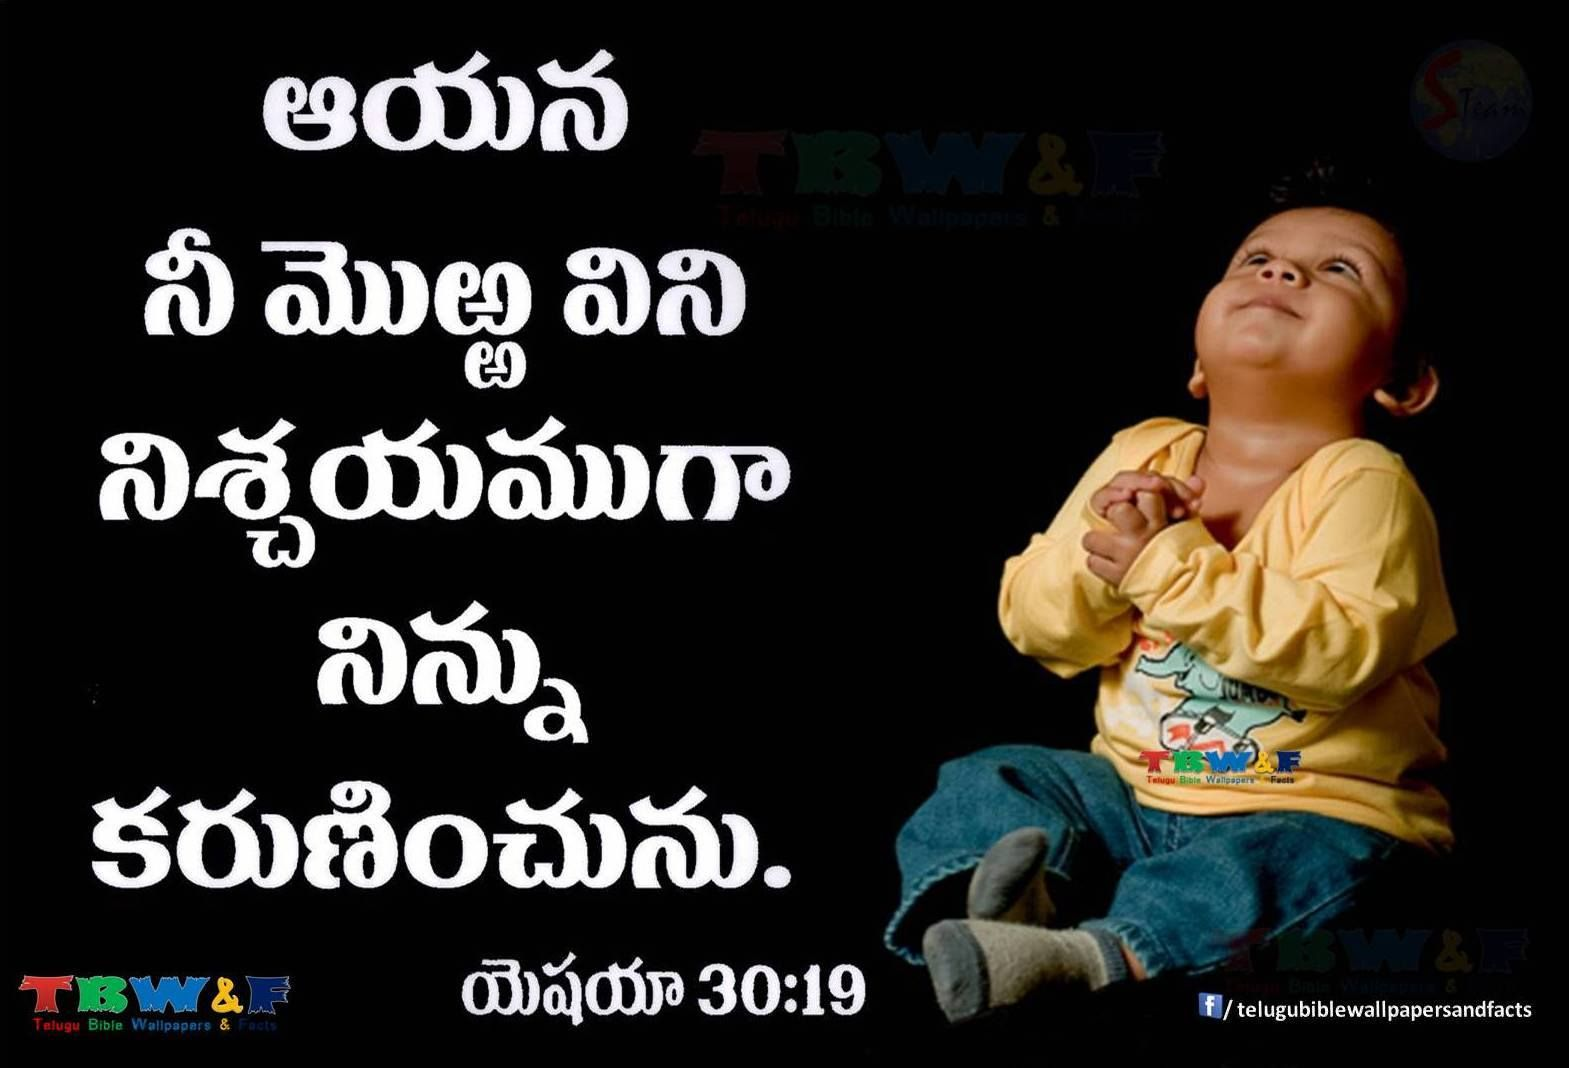 Isaiah 30 9 Jesus Quotes Inspirational Bible Quotes Bible Quotes Telugu